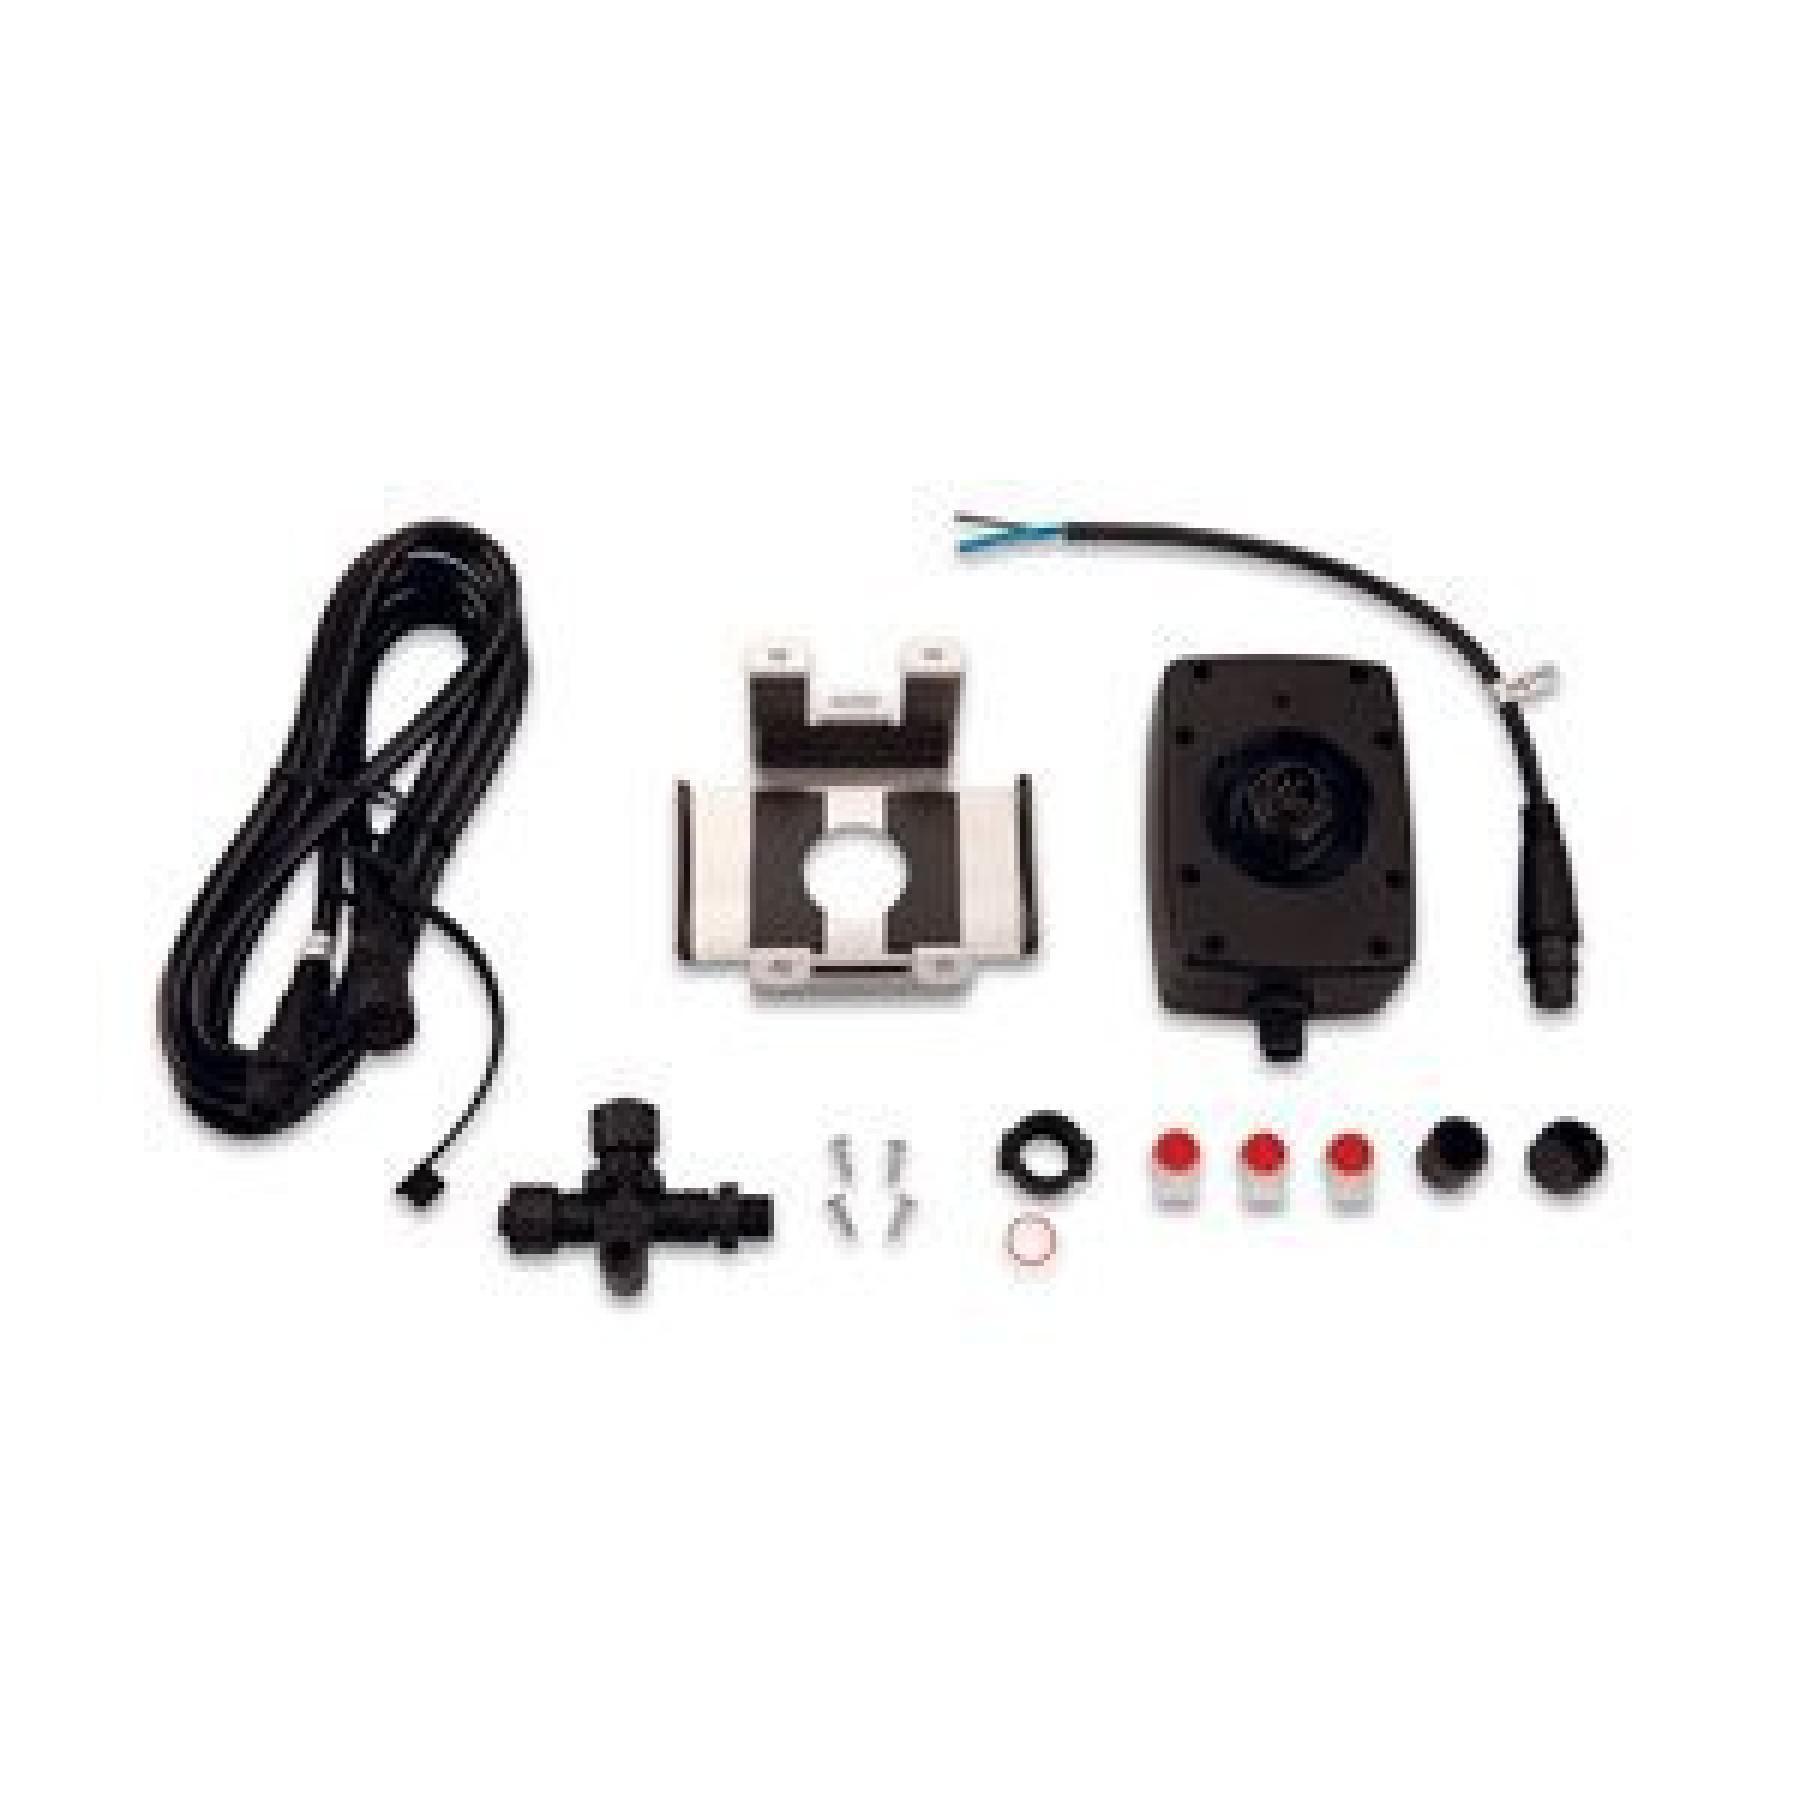 Garmin nmea 2000 traditional adaptation kit